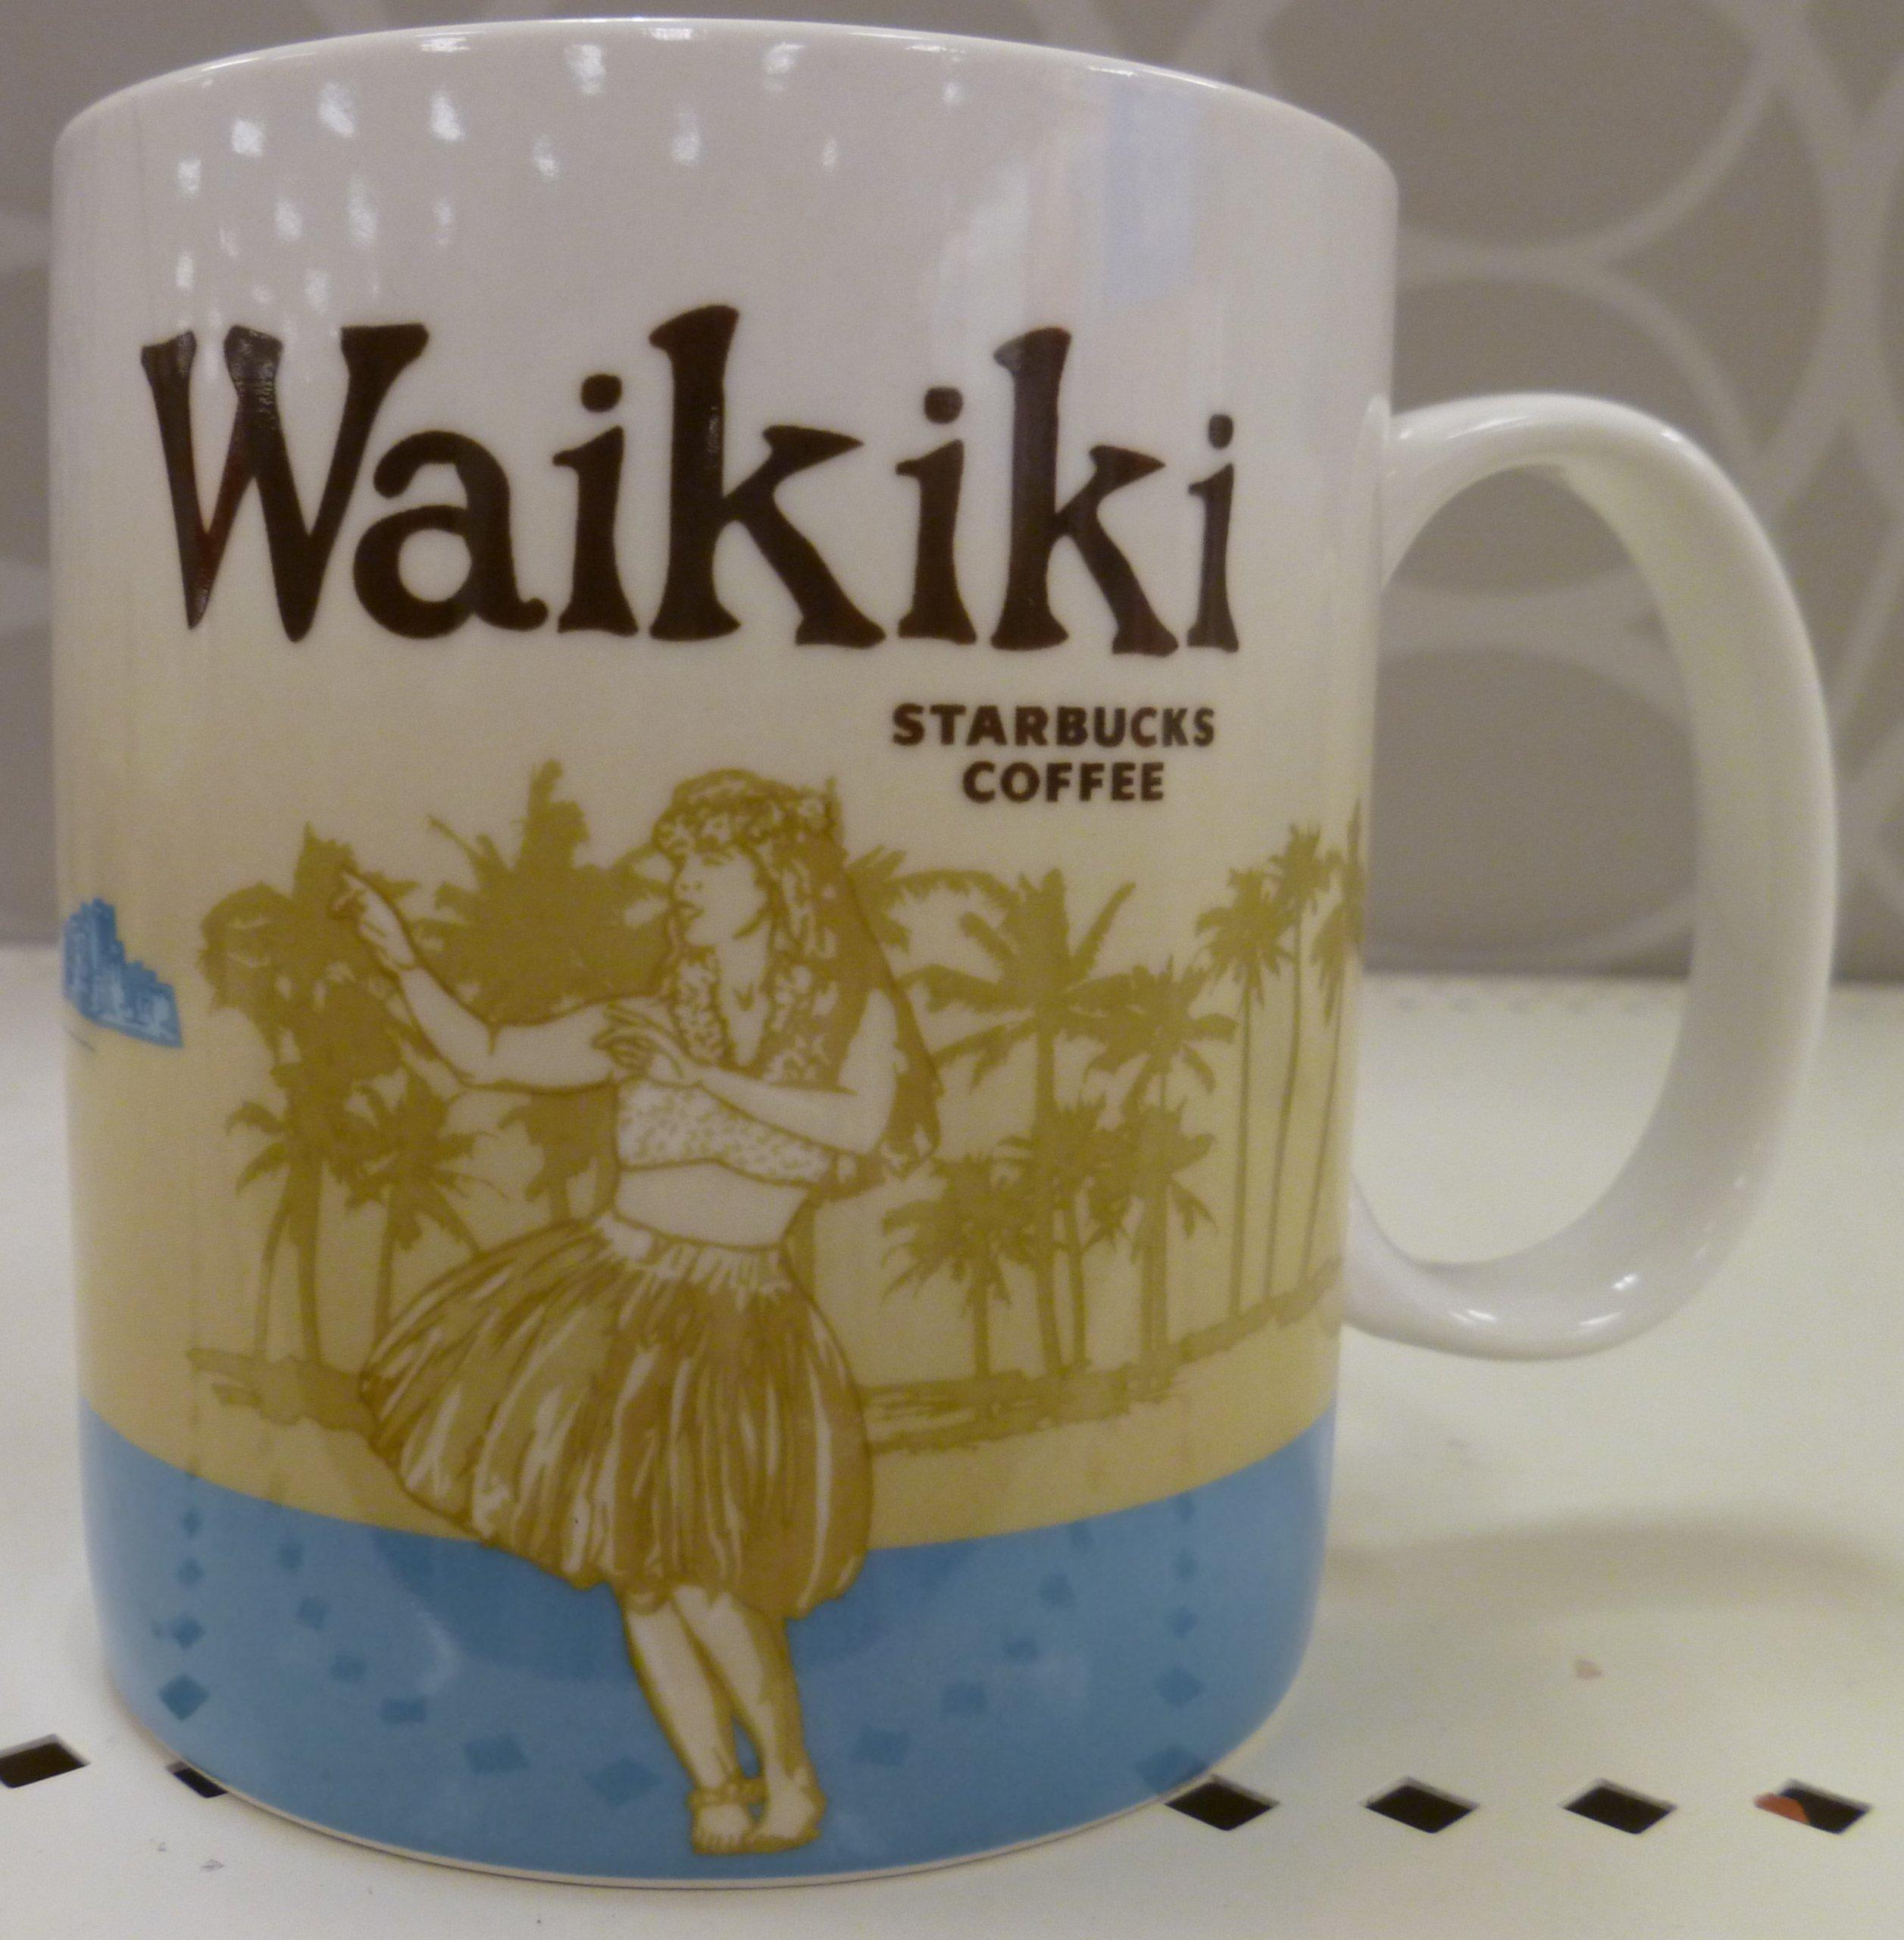 Starbucks Hawaii - Waikiki Collector Coffee Mug by Starbucks